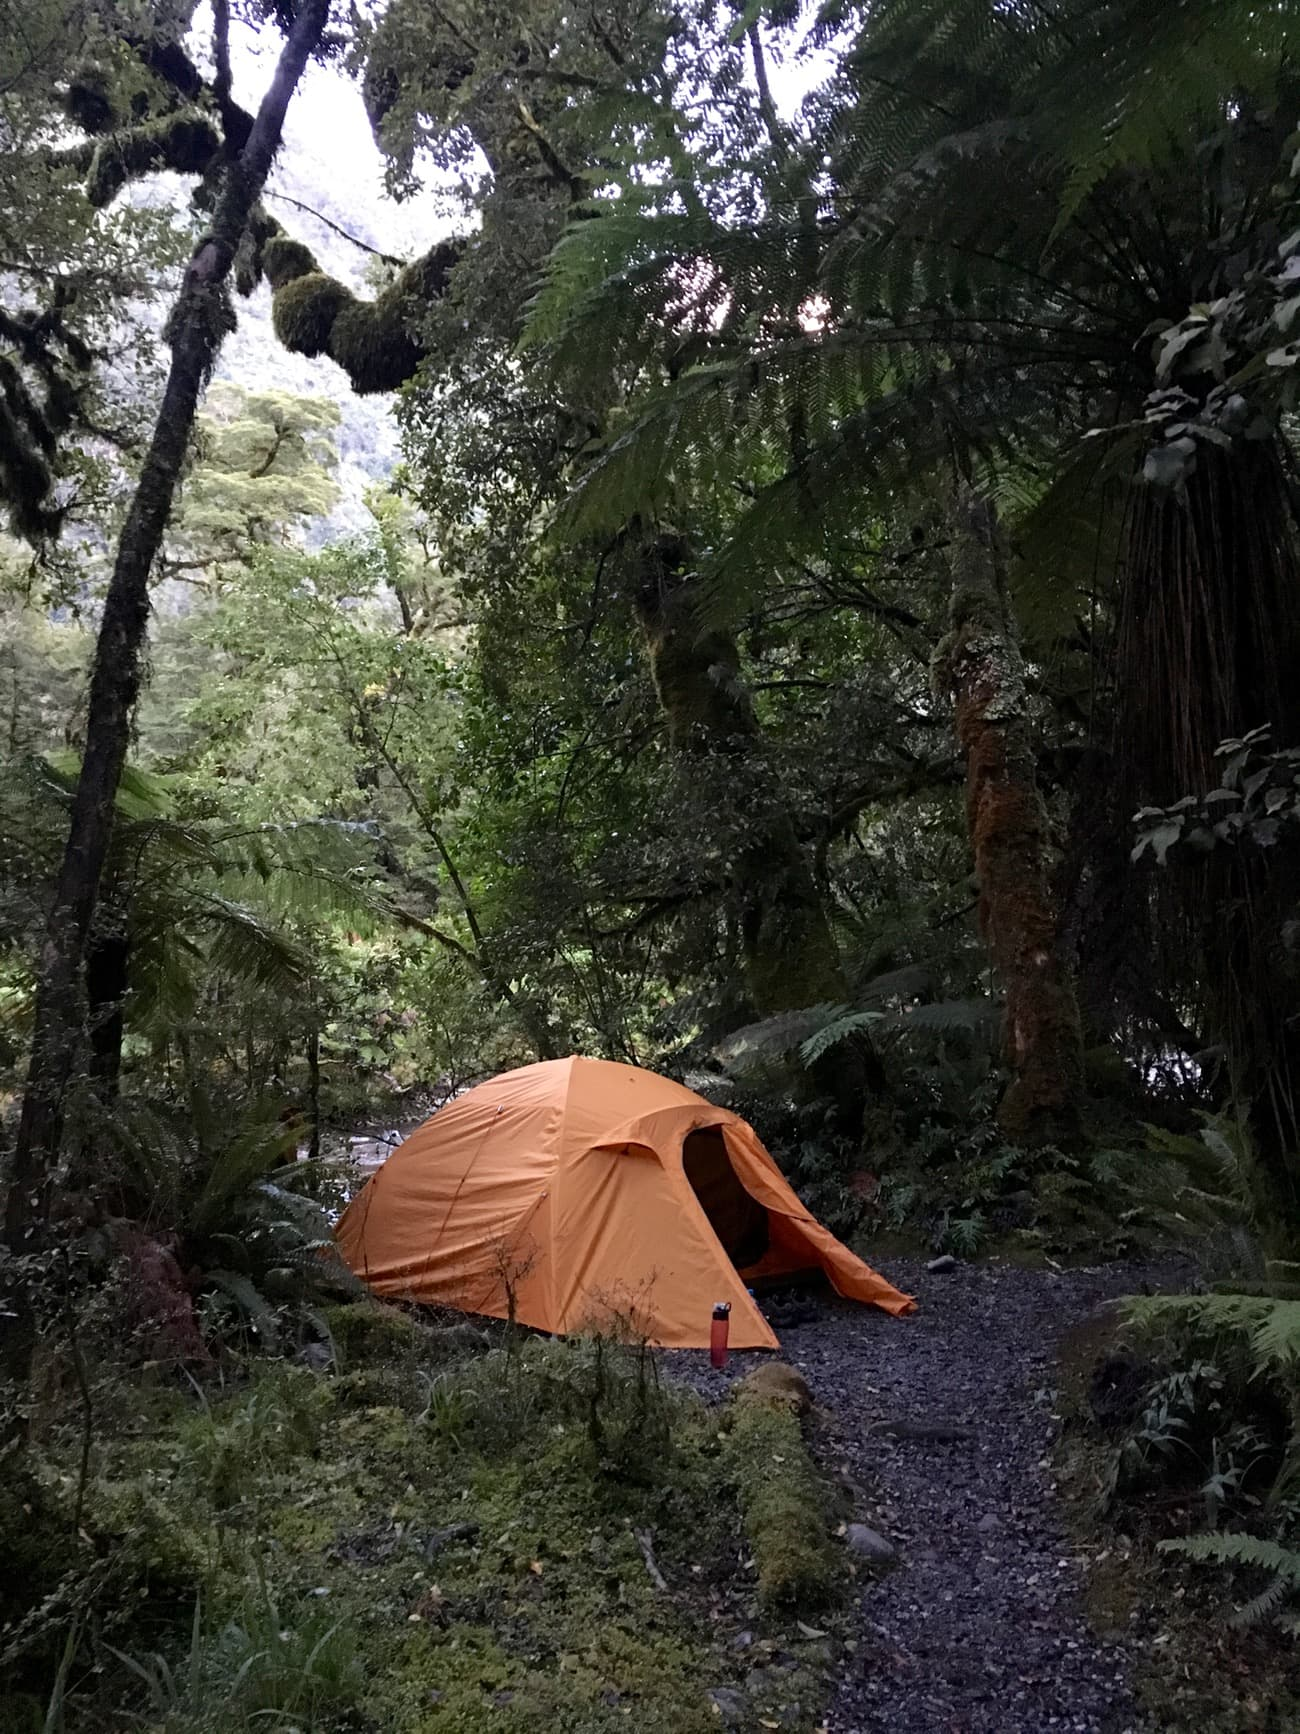 My campsite on my Doubtful Sound overnight kayaking trip with Go Orange.